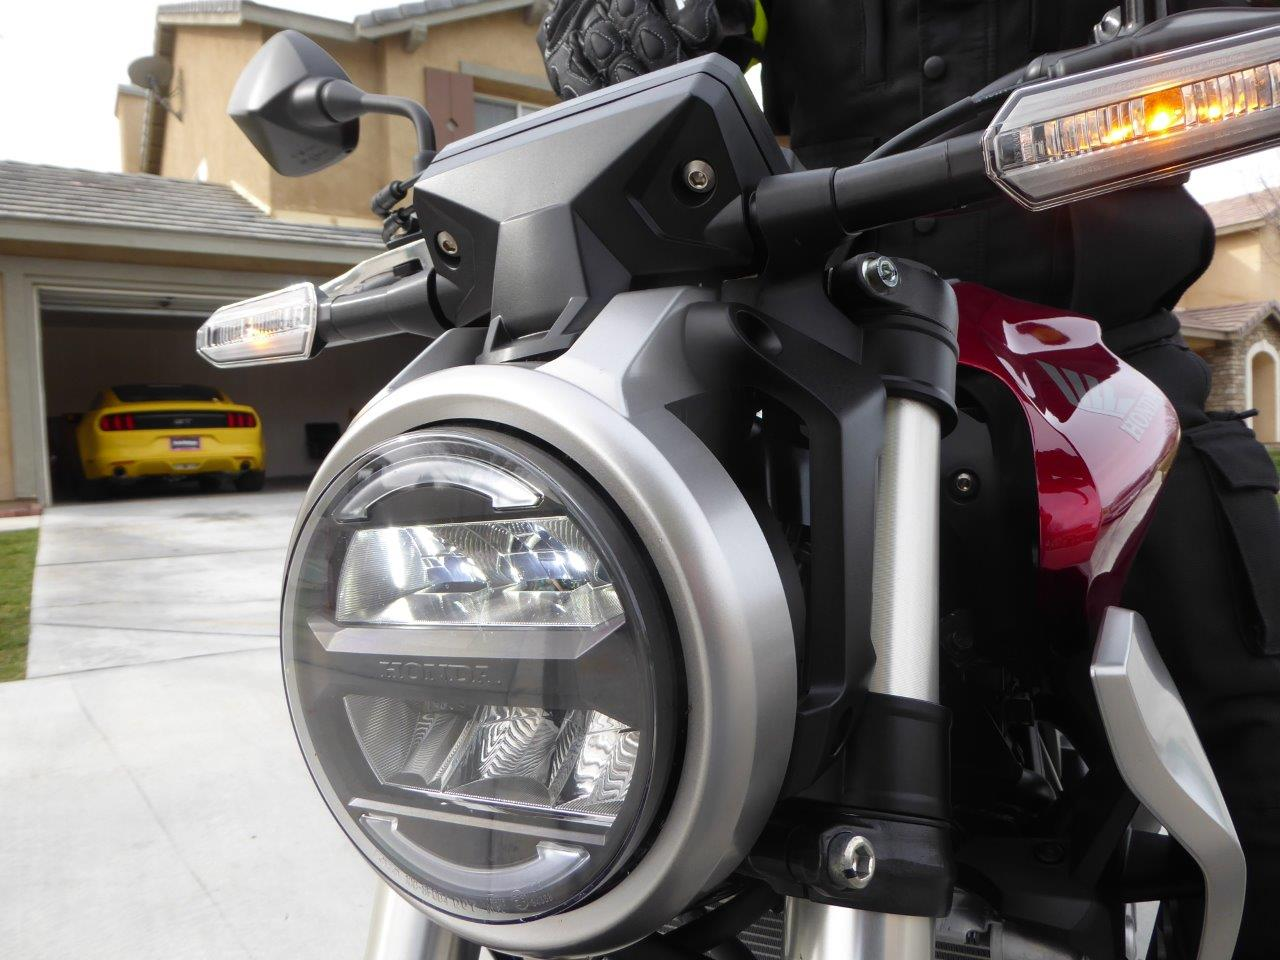 2019 Honda CB300R headlight and blinkers.